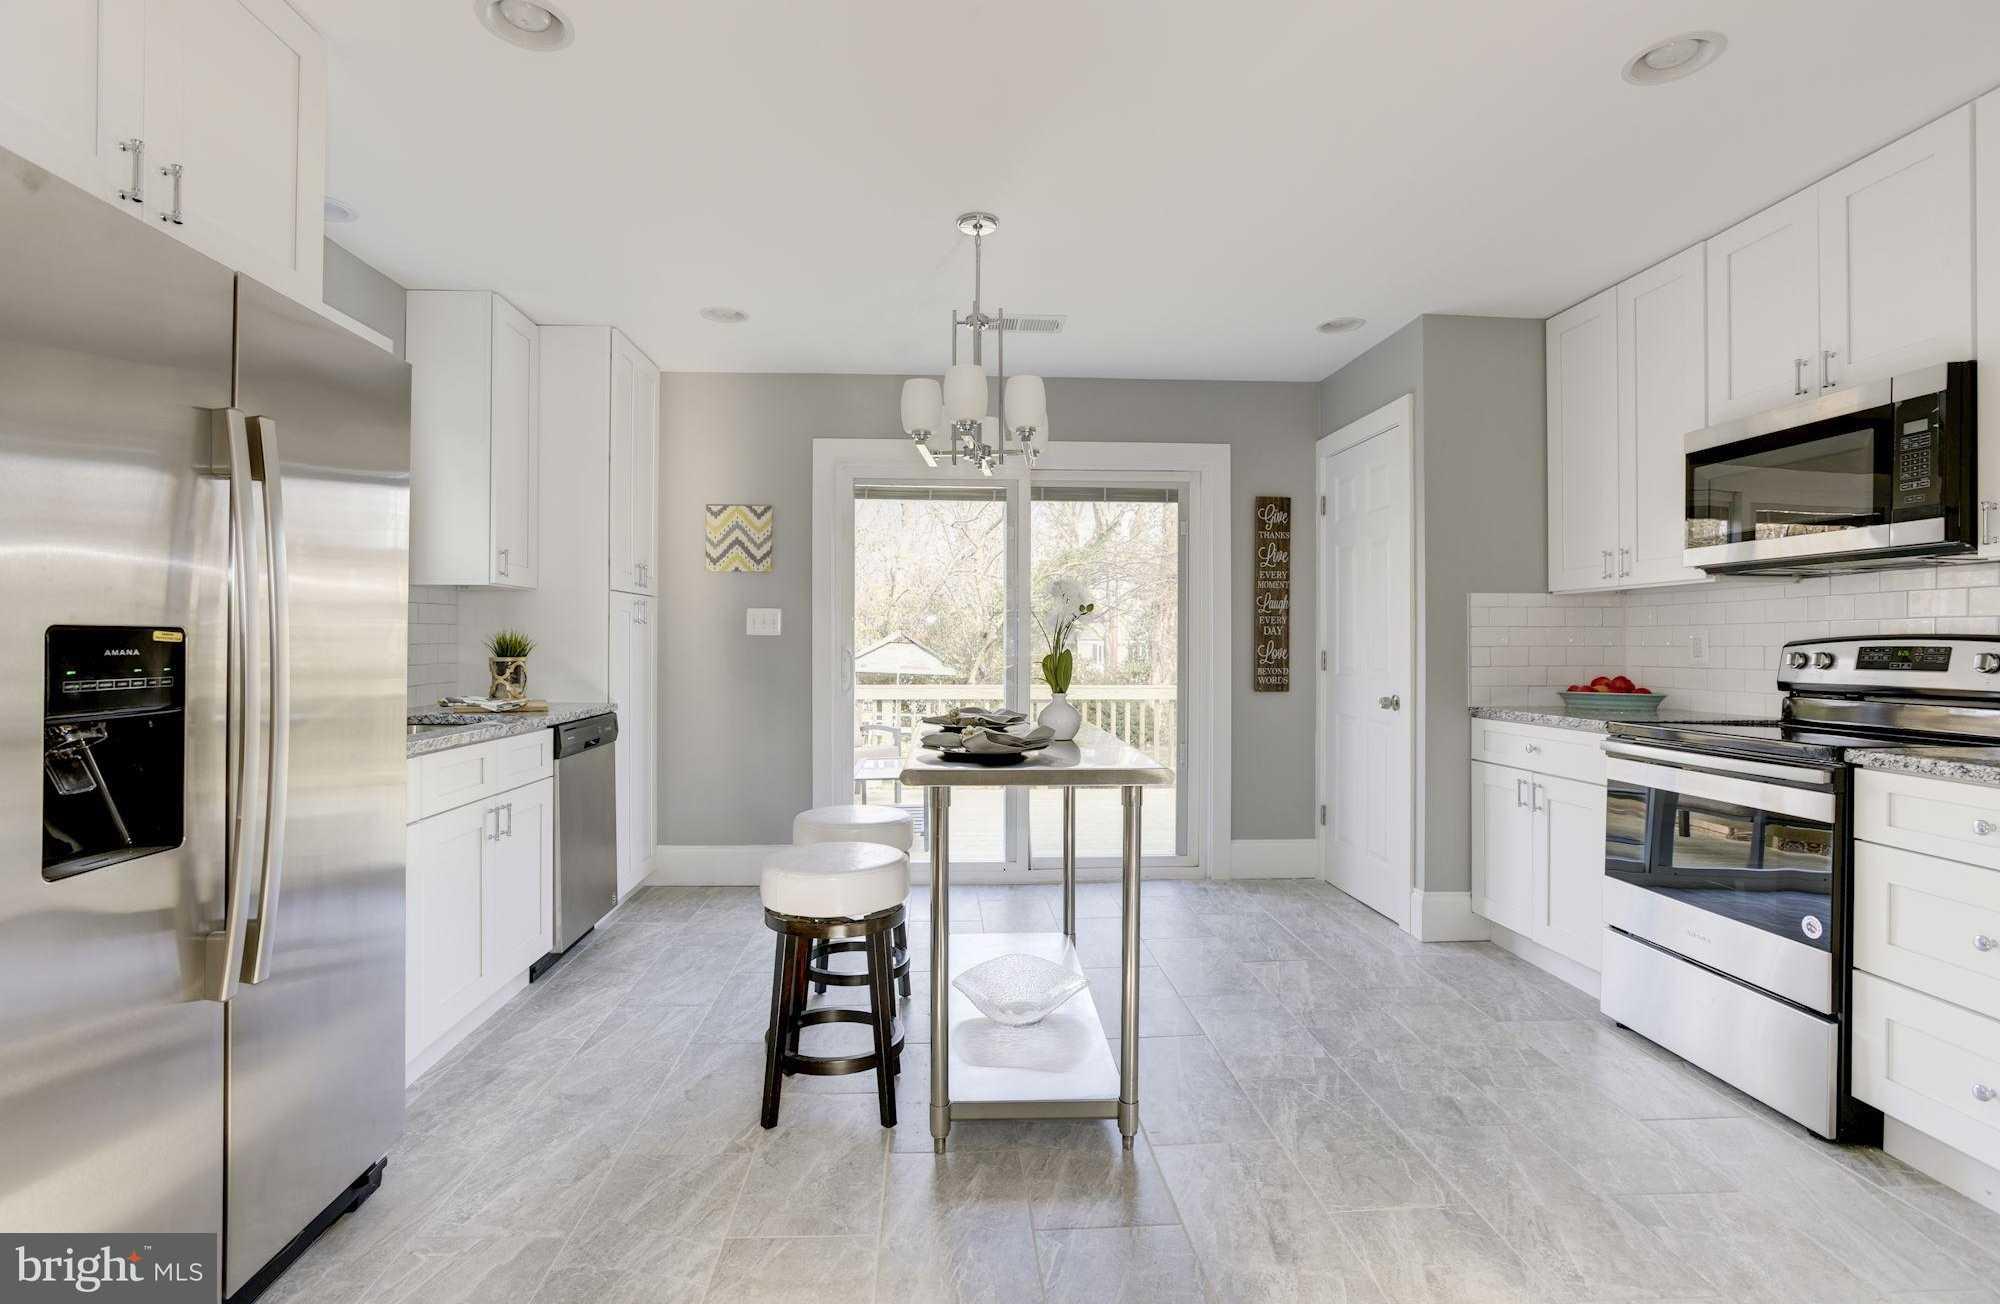 Homes for Sale in Falls Church - TANA KEEFFE — EARMAN FAMILY ...